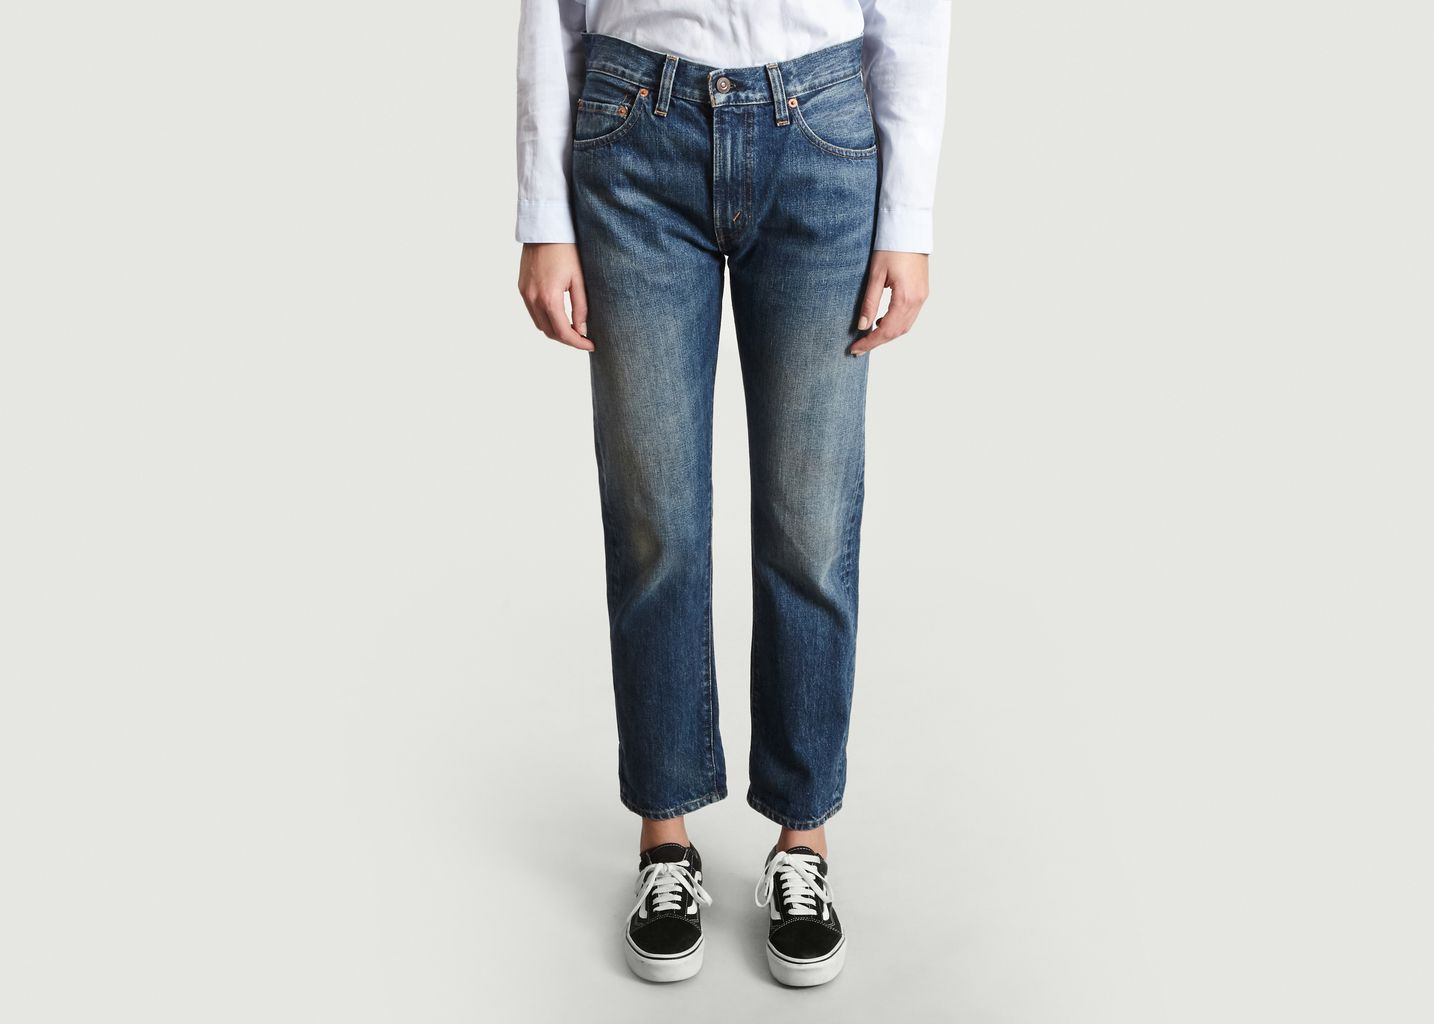 Jeans 1967 505™ Selvedge - Levi's Vintage Clothing